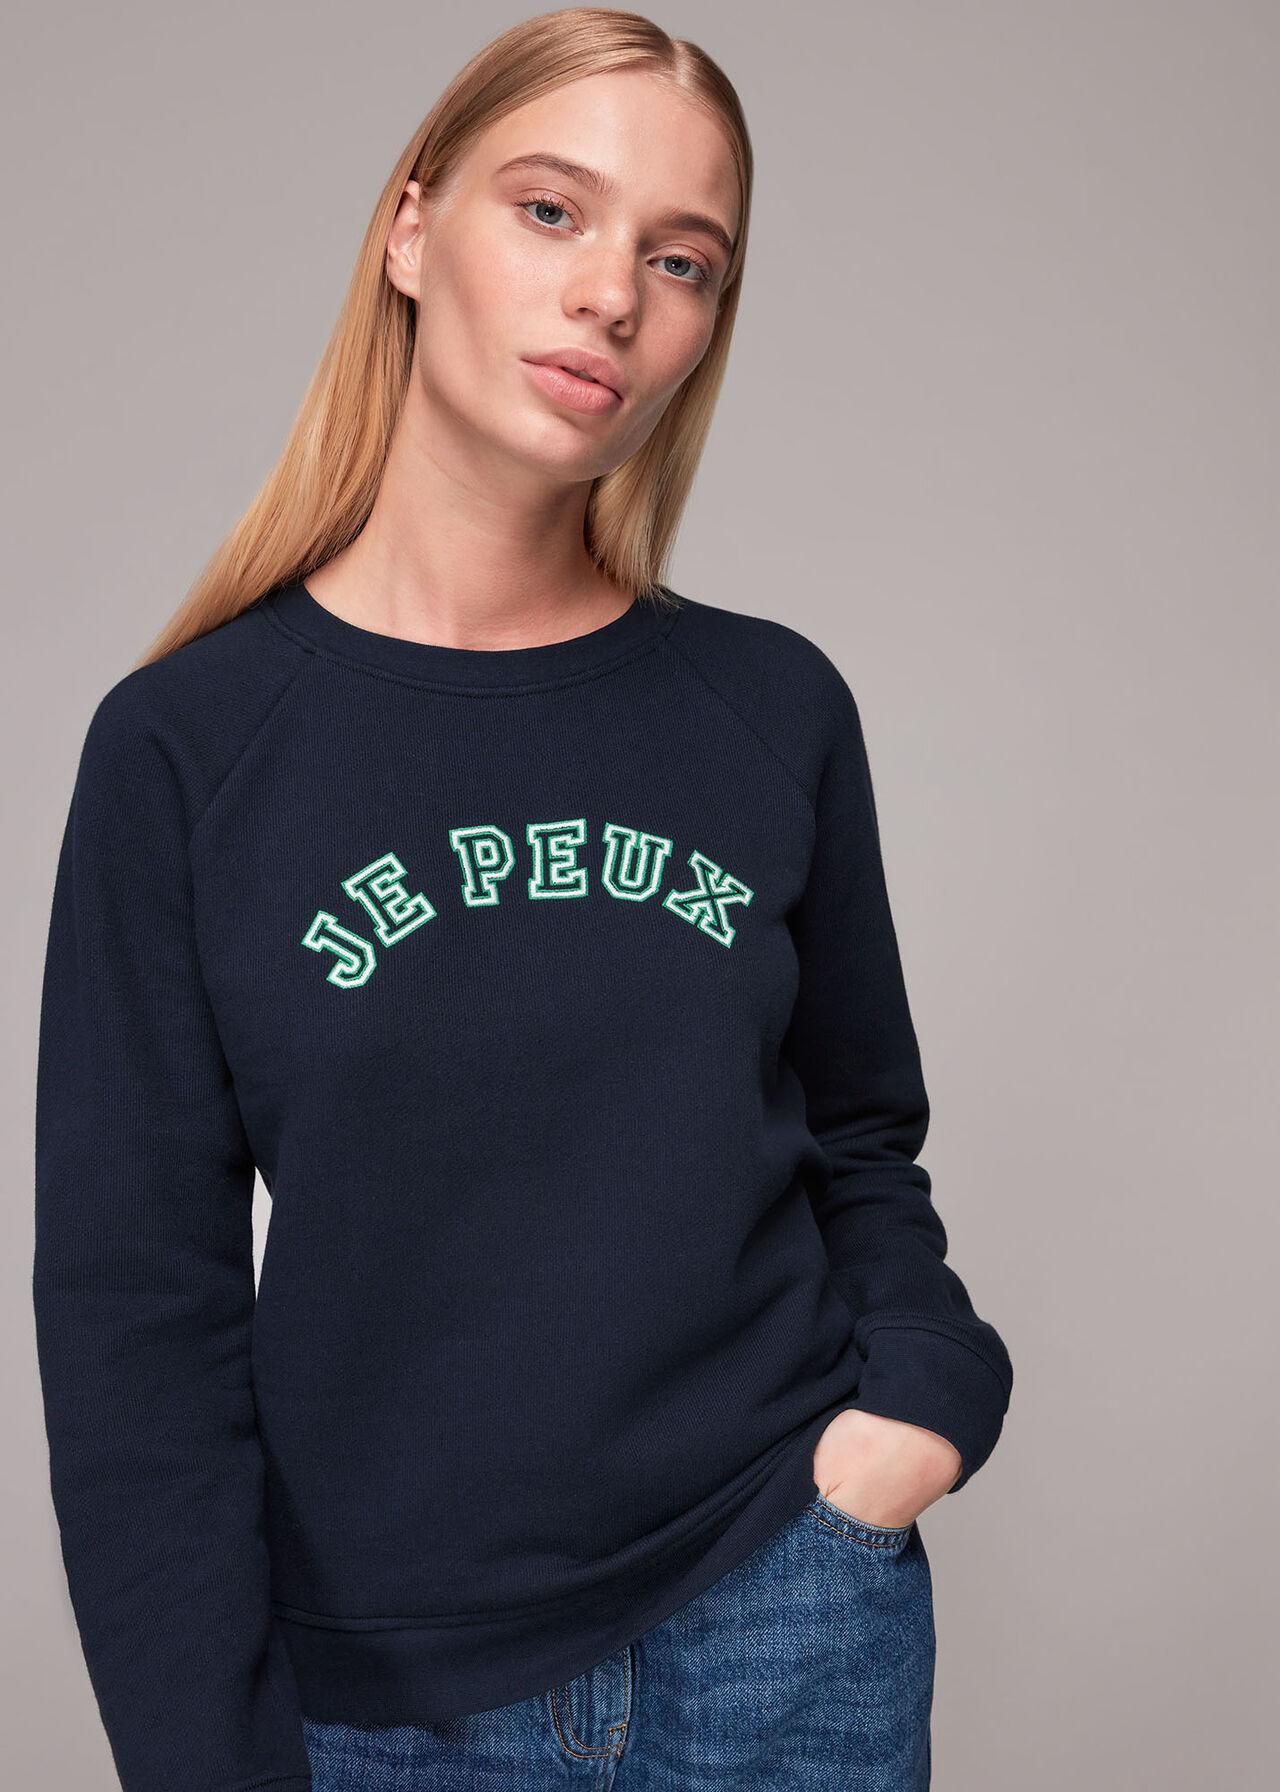 Je Peux Logo Sweatshirt